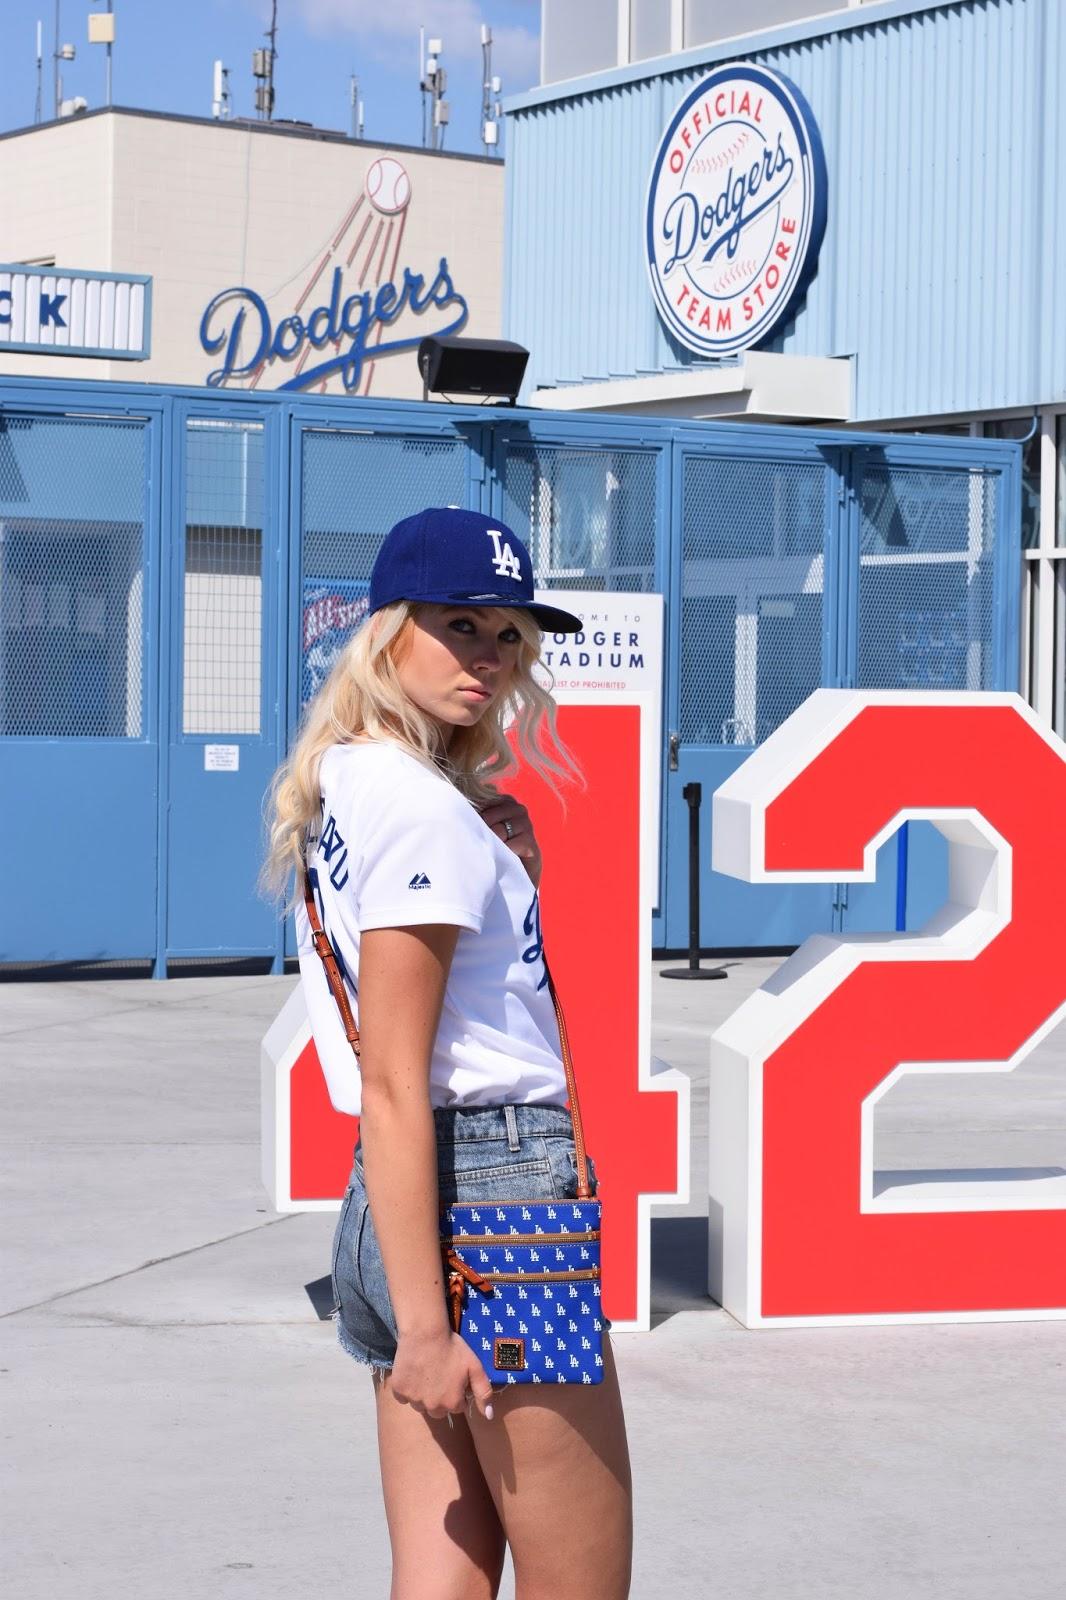 Baseball, mlb, dodgers, LA dodgers, itfdb, dooney and bourke, dooney & bourke, Dooney and bourke mlb bag,  MLB dodgers crossbody, dodgers purse, la purse, baseball fan, blue, dodgers stadium